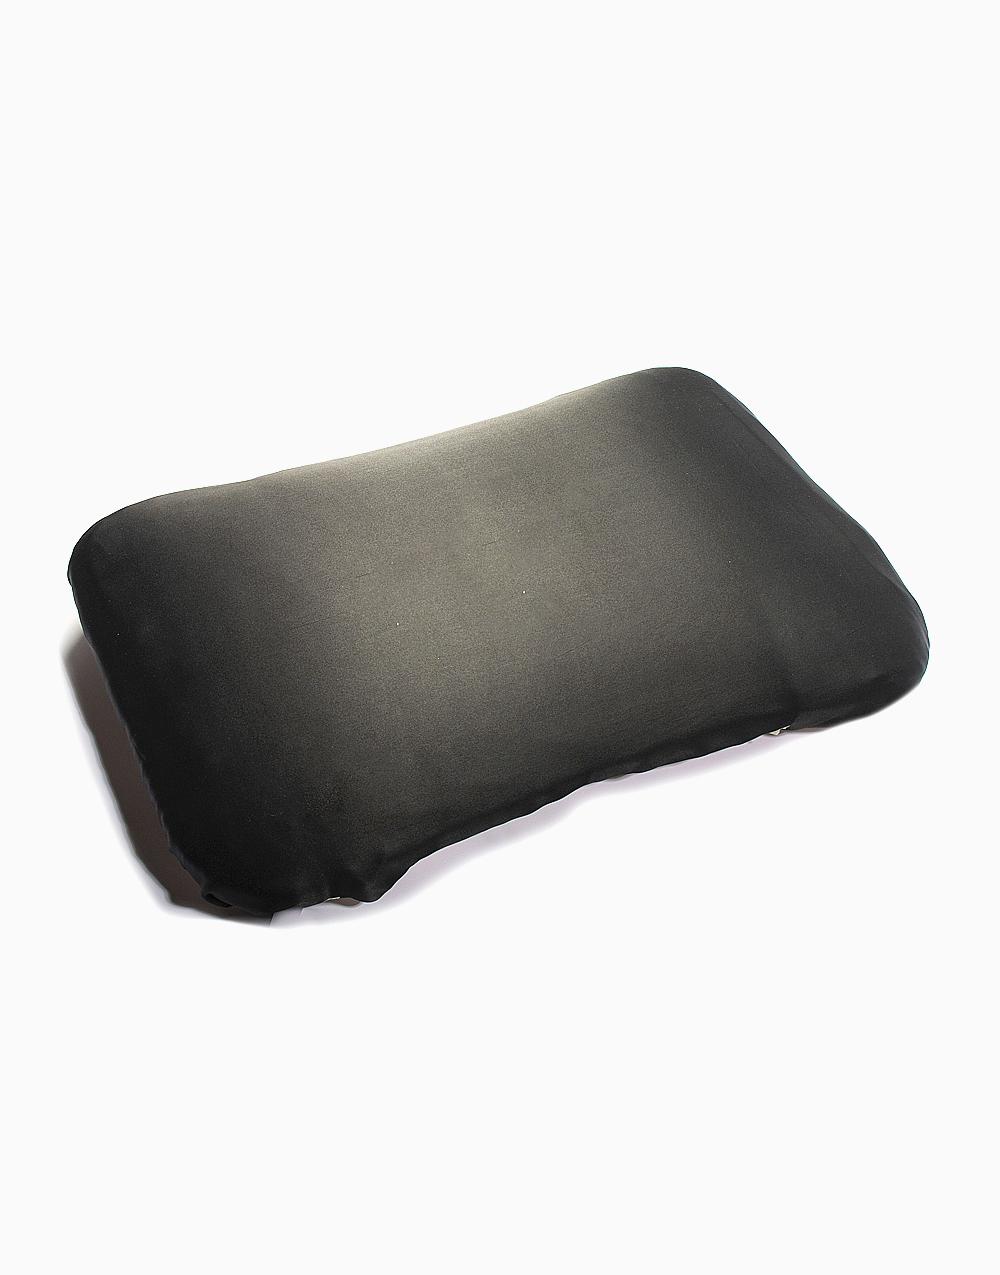 Anti-Wrinkle Silk Pillowcase by The Facialist | Black